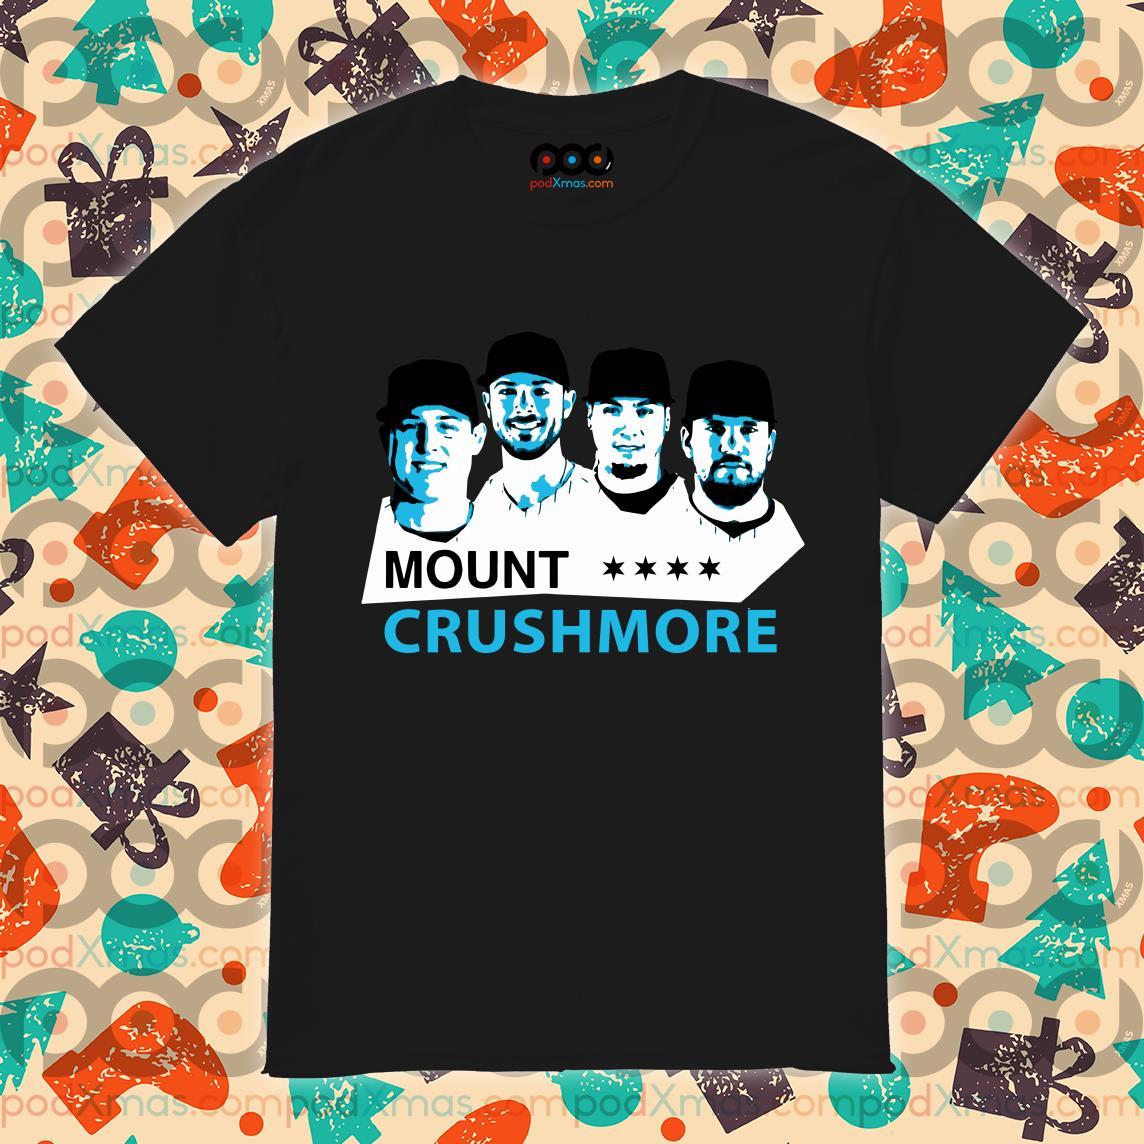 Mount Crushmore Toronto shirt